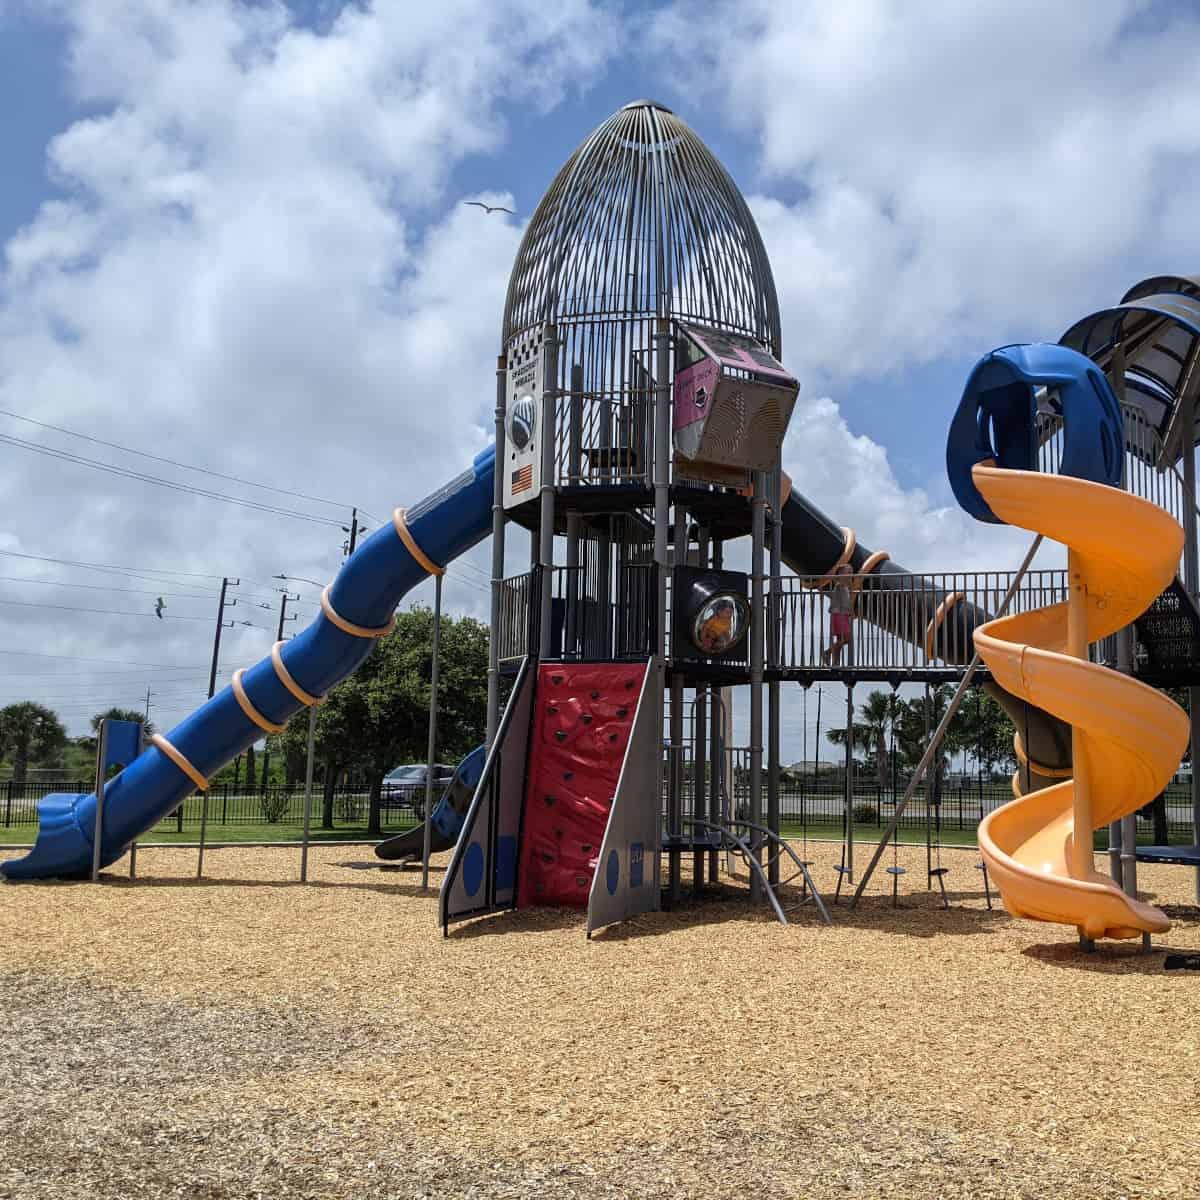 Space Shuttle Playground